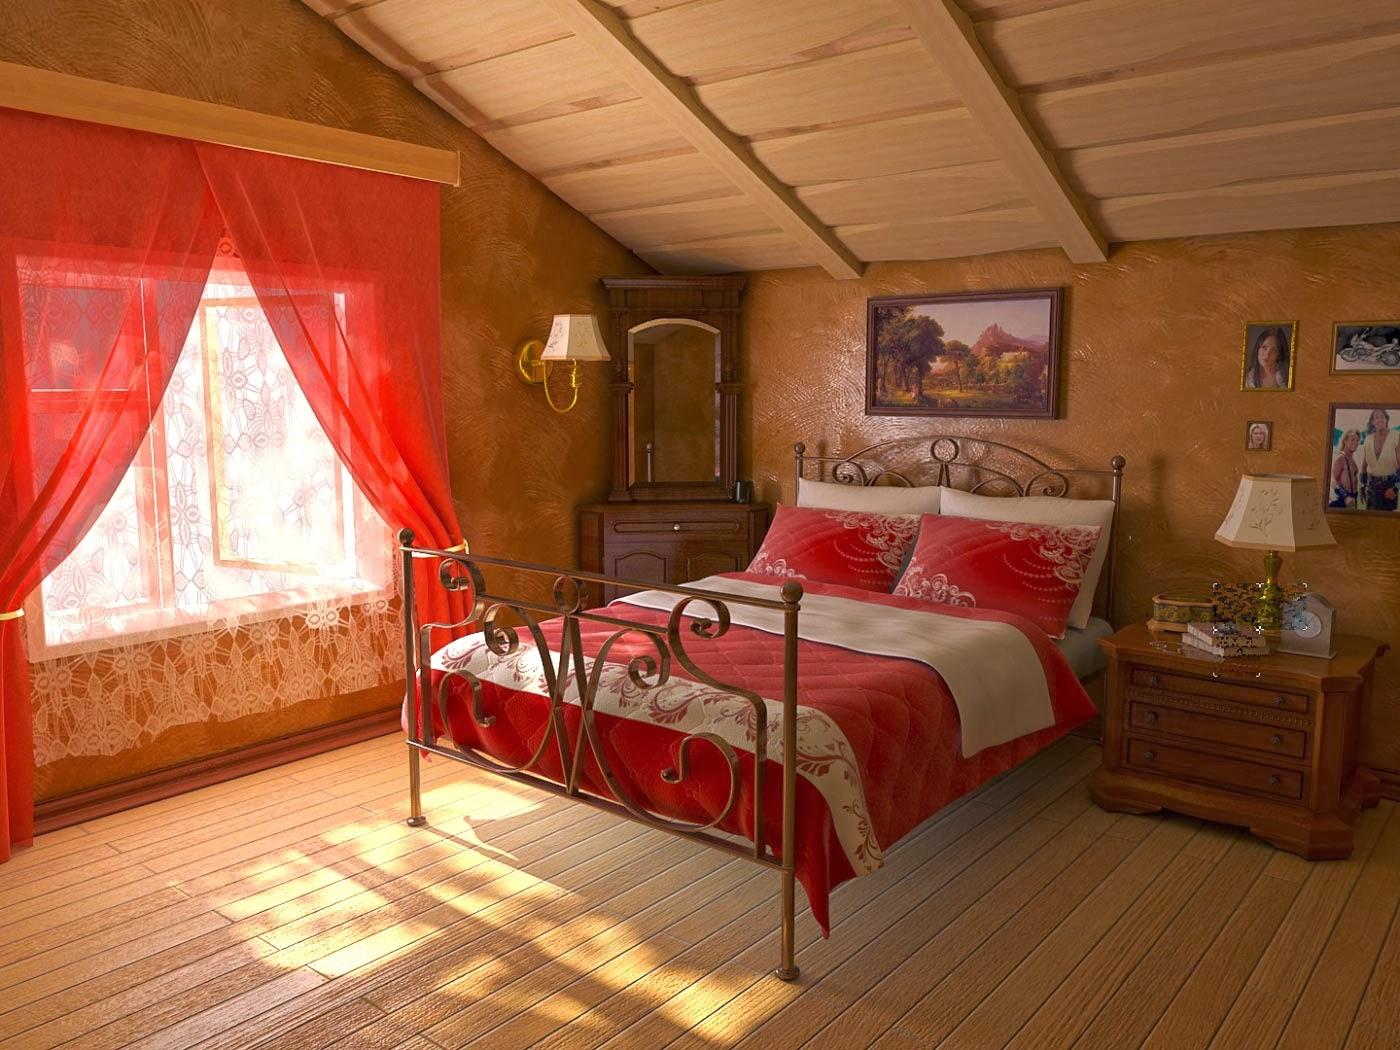 Attic Bedroom Ideas: Foundation Dezin & Decor...: Attic Bedroom Design